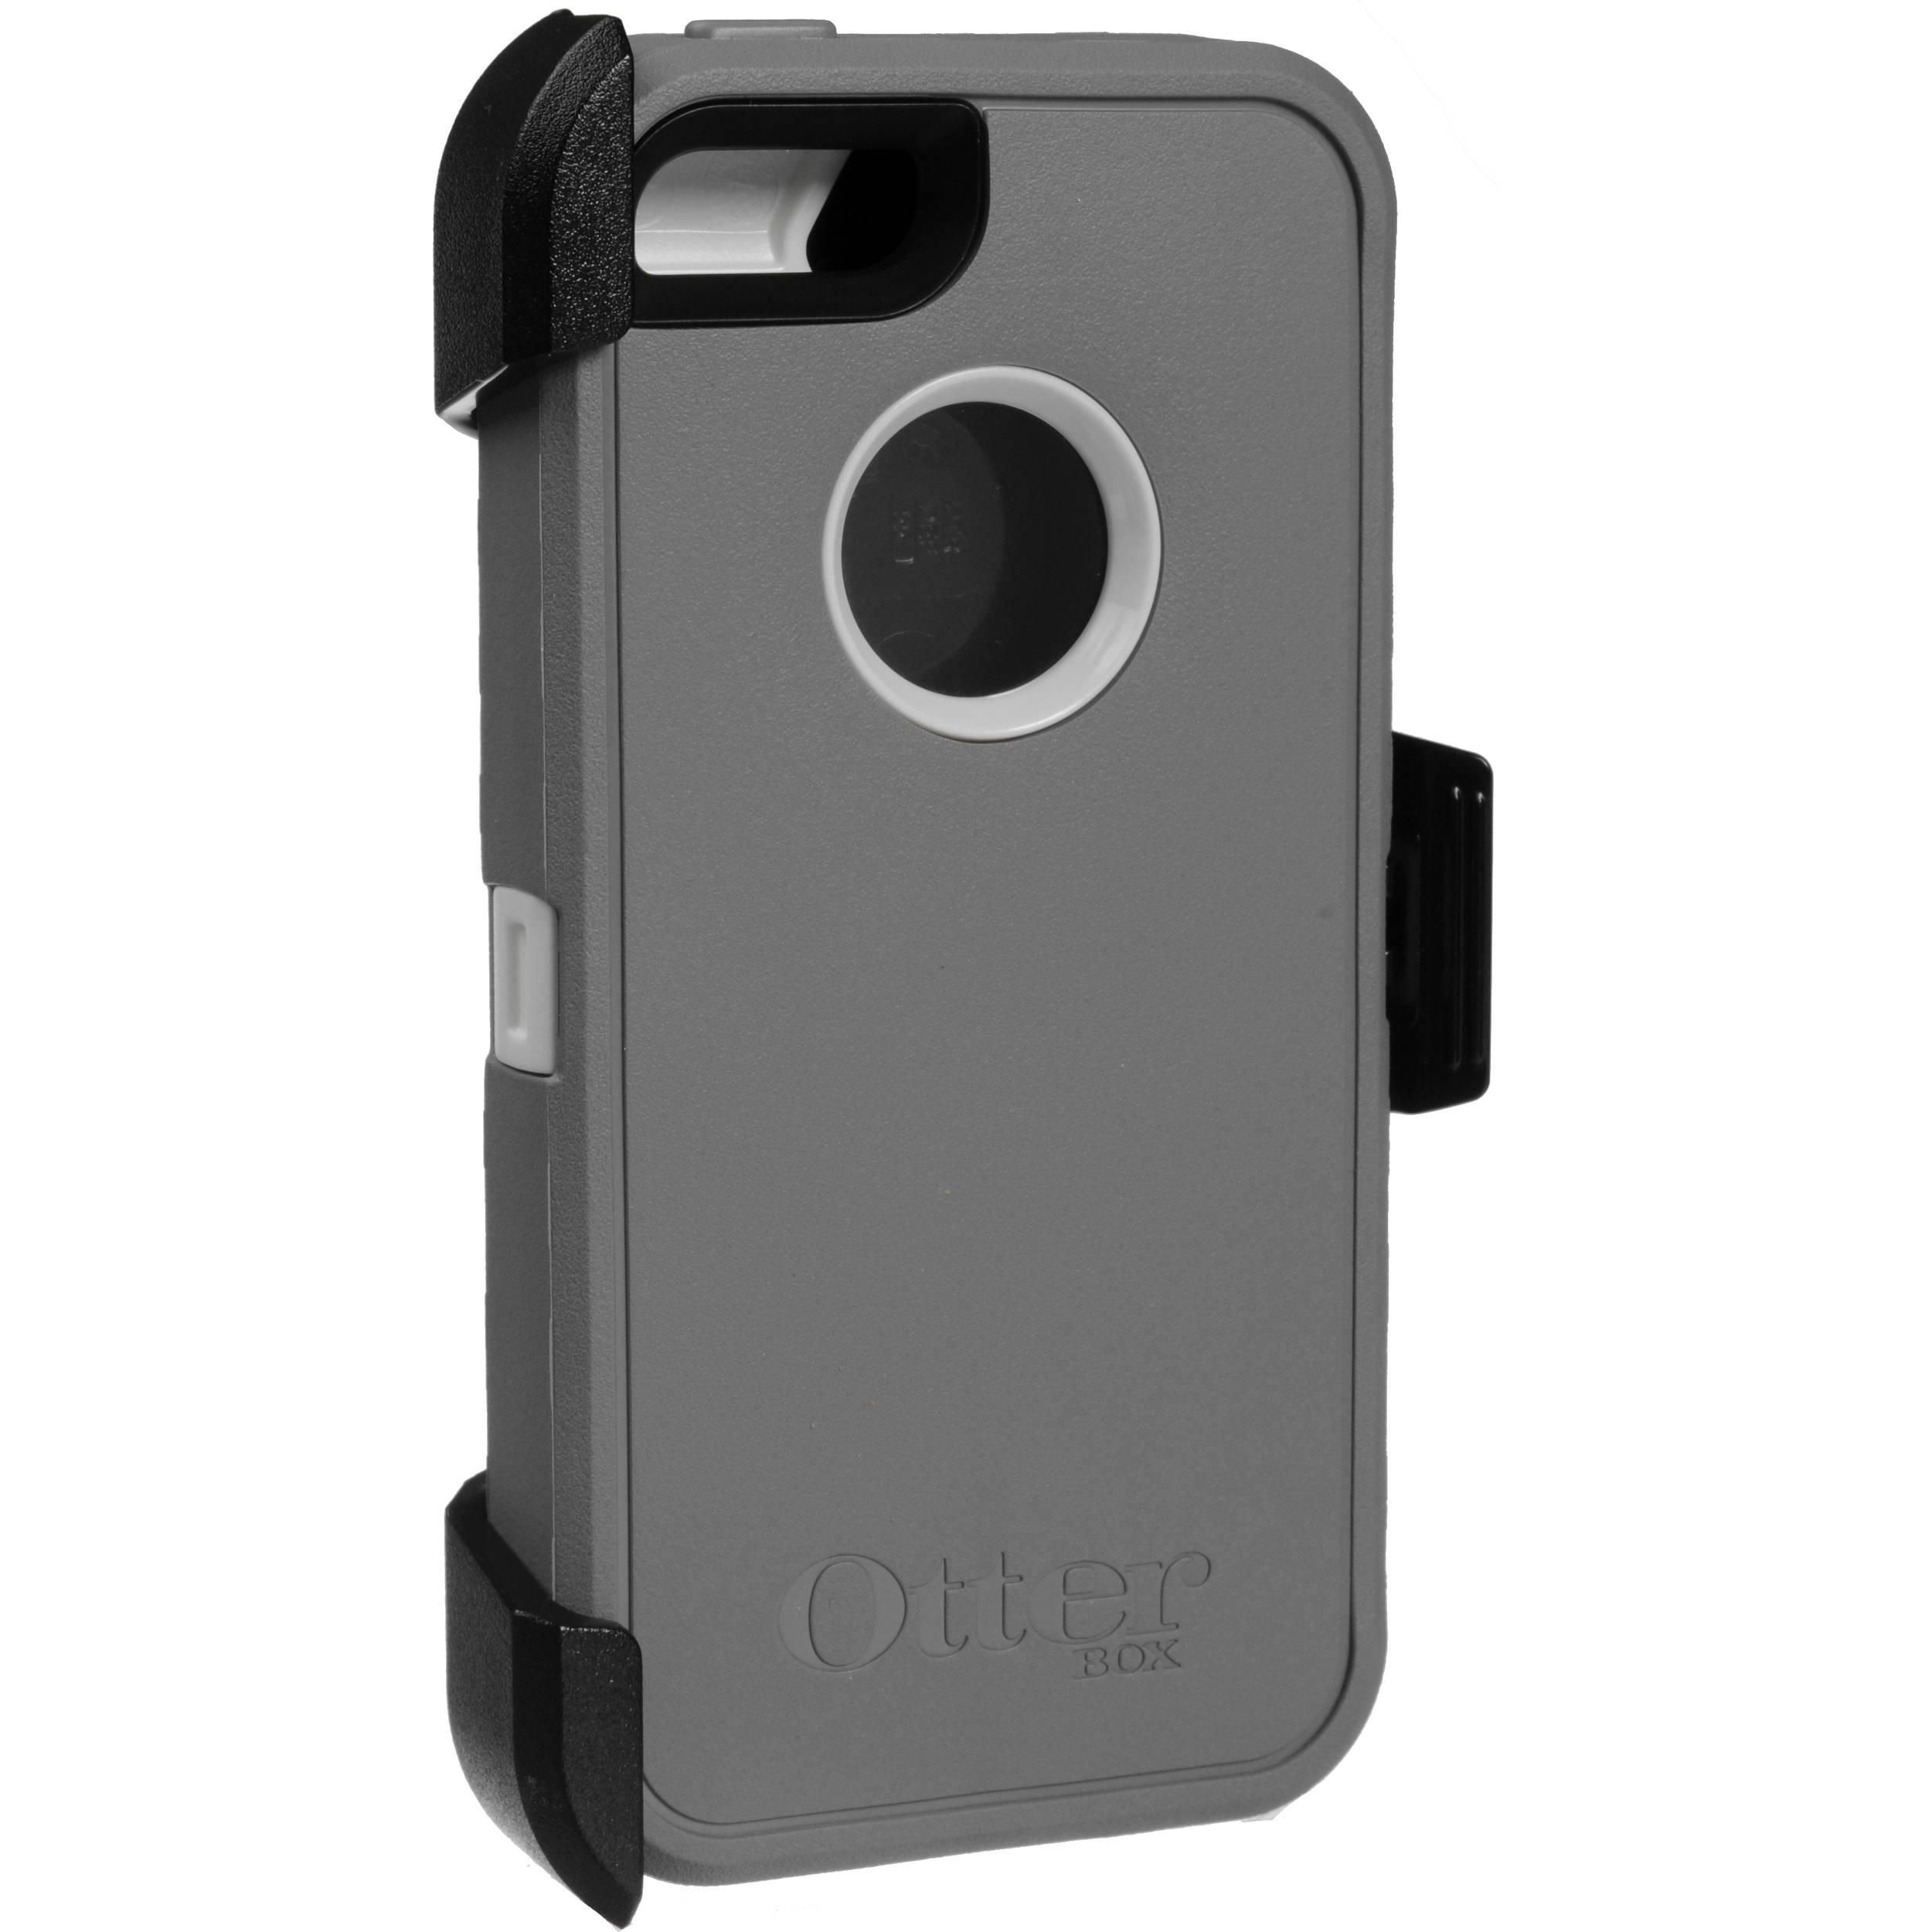 info for df0b1 c6fd7 OtterBox Defender Series Case for iPhone 5/5s/SE (Glacier)